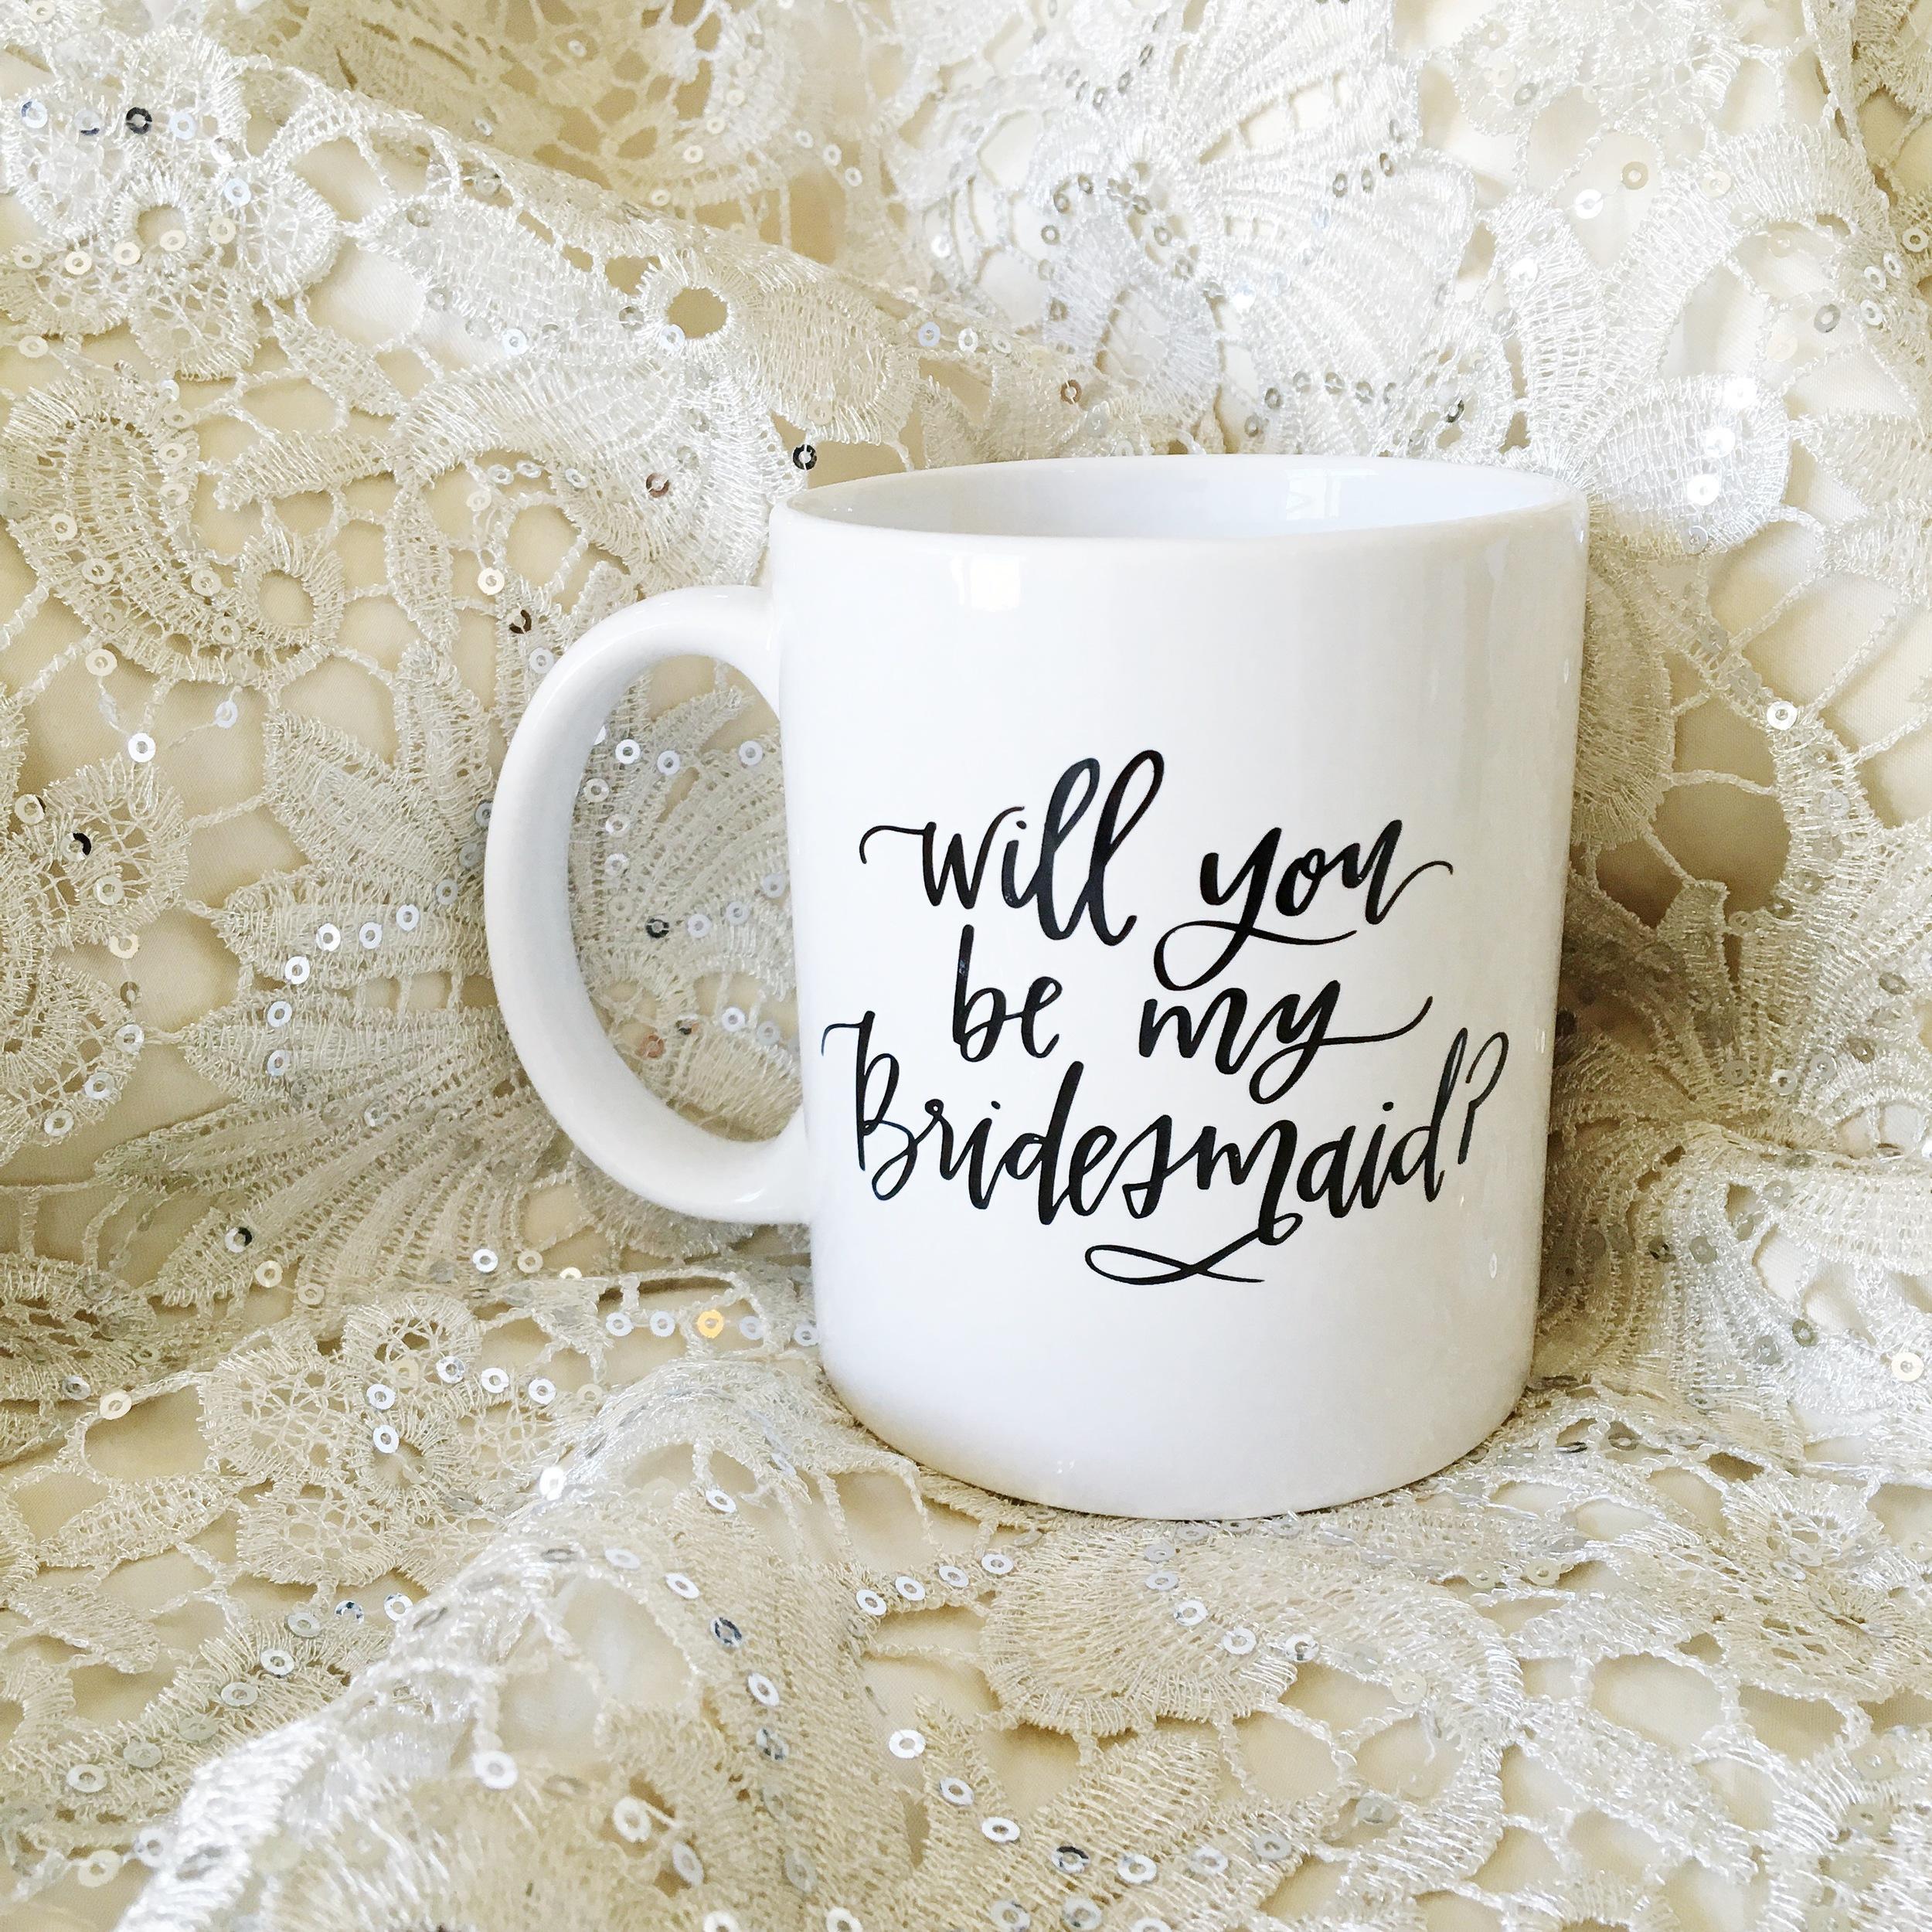 Bridesmaid Mug - Lettered Life